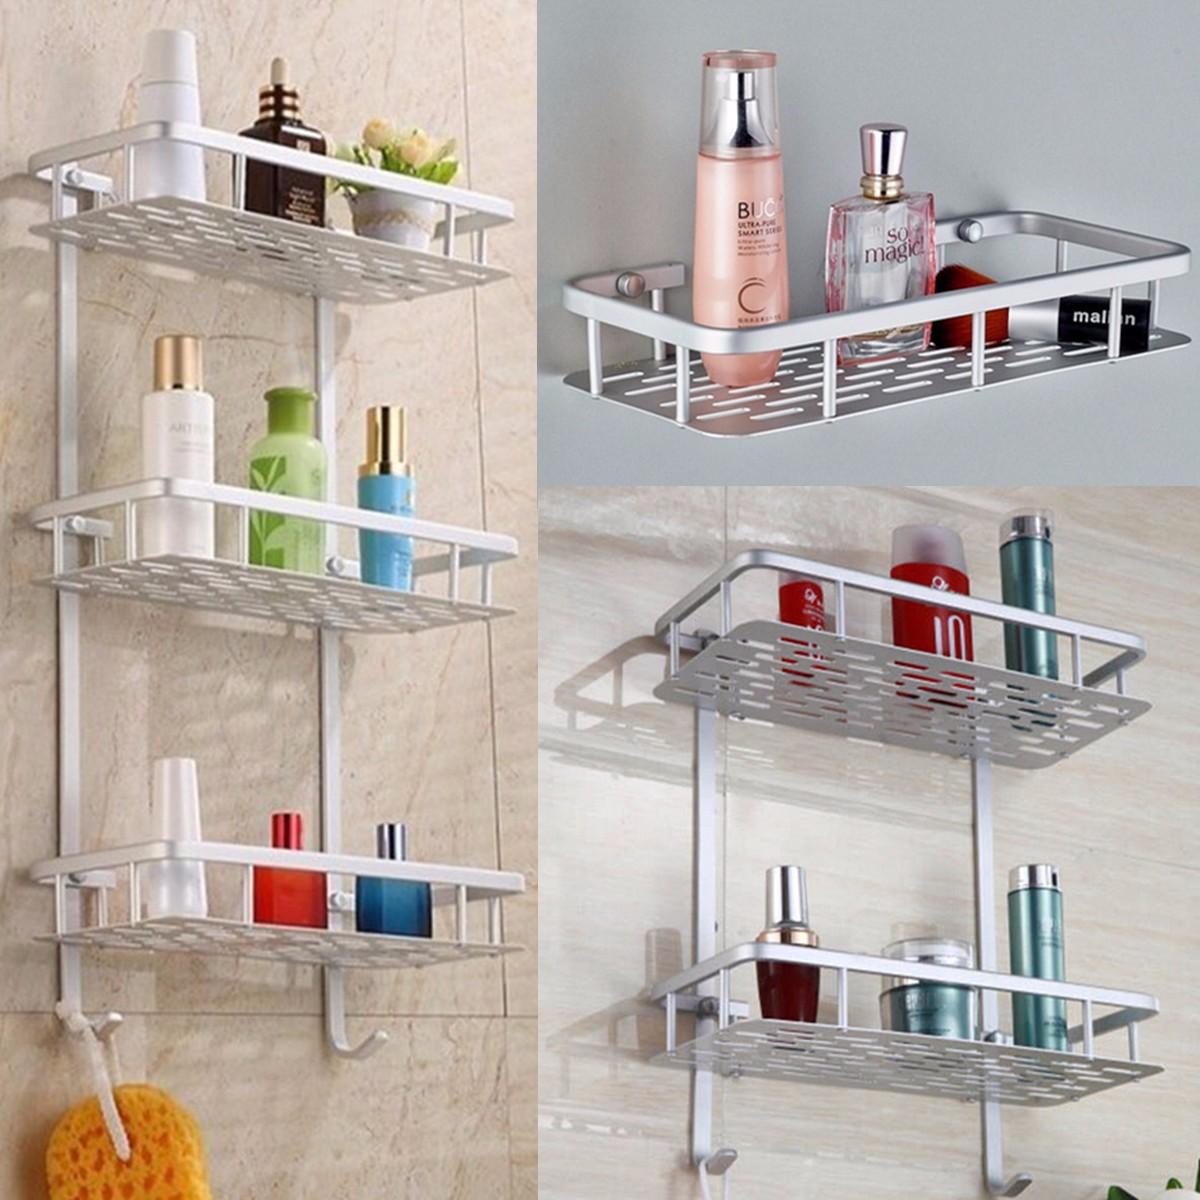 Home Bathroom Space Side Mount Shower Caddy Storage Organizer Shelf ...